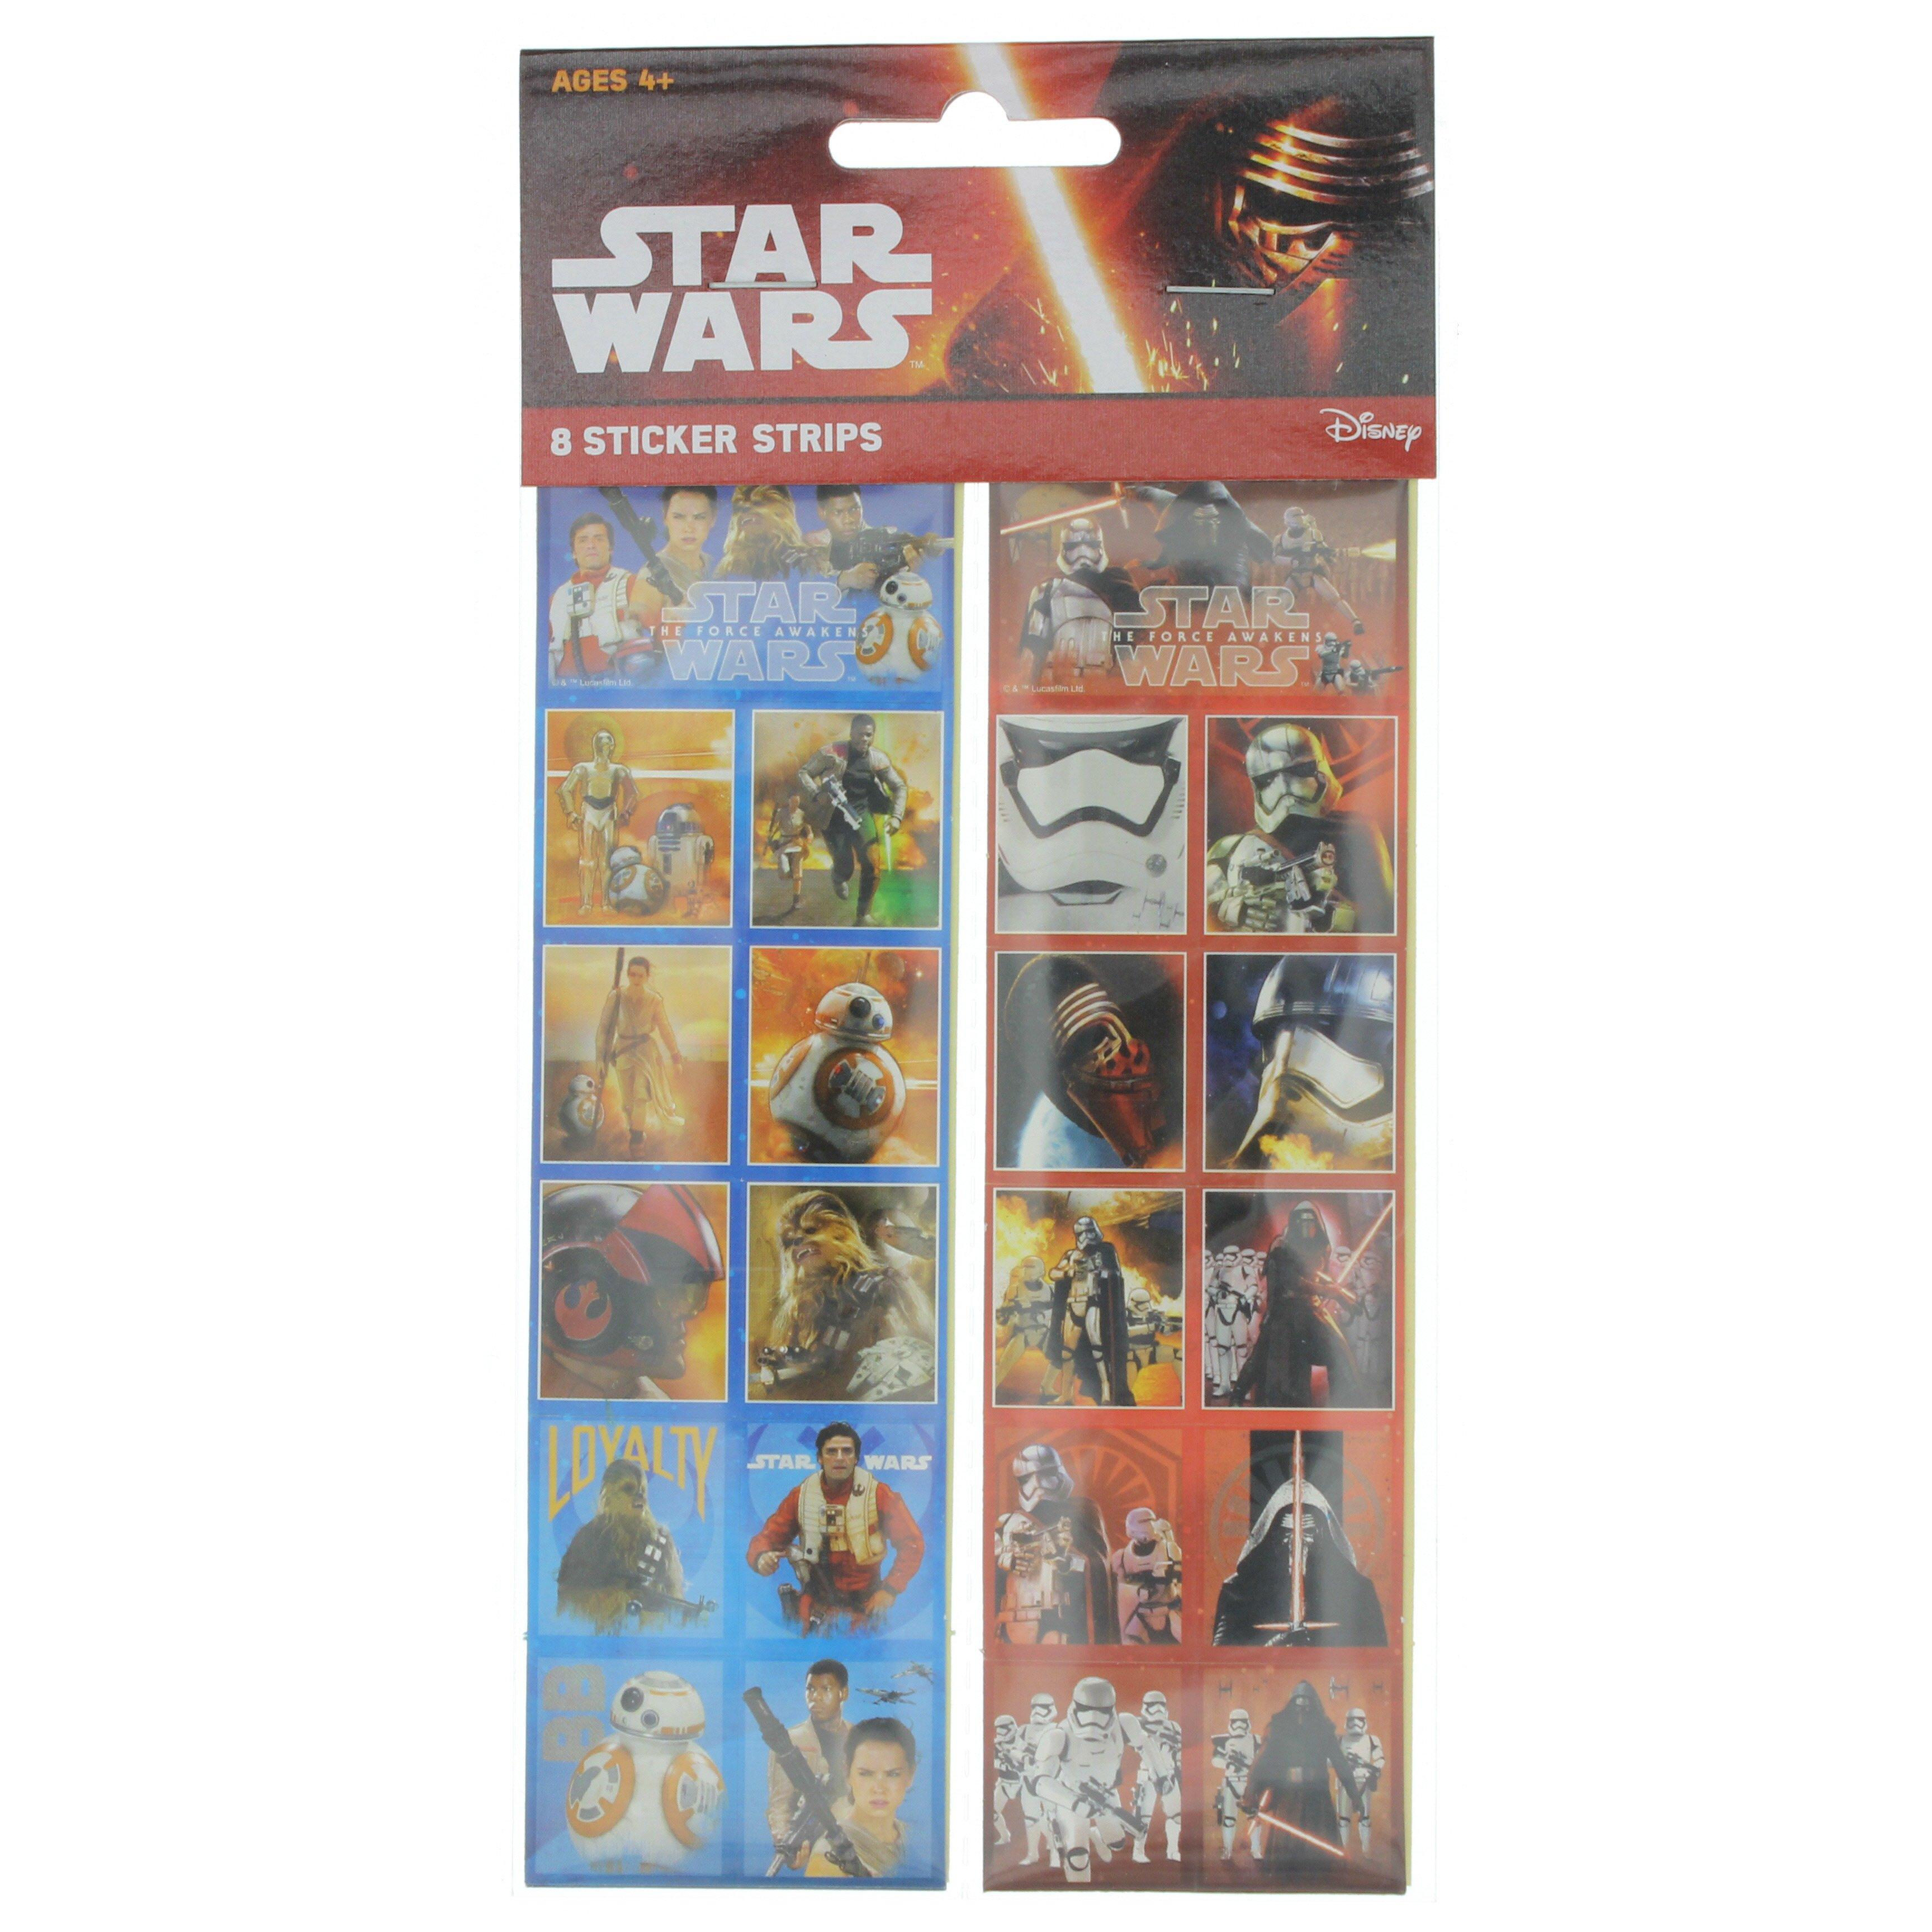 American Greetings Star Wars Sticker Strip Shop Craft Supplies At Heb